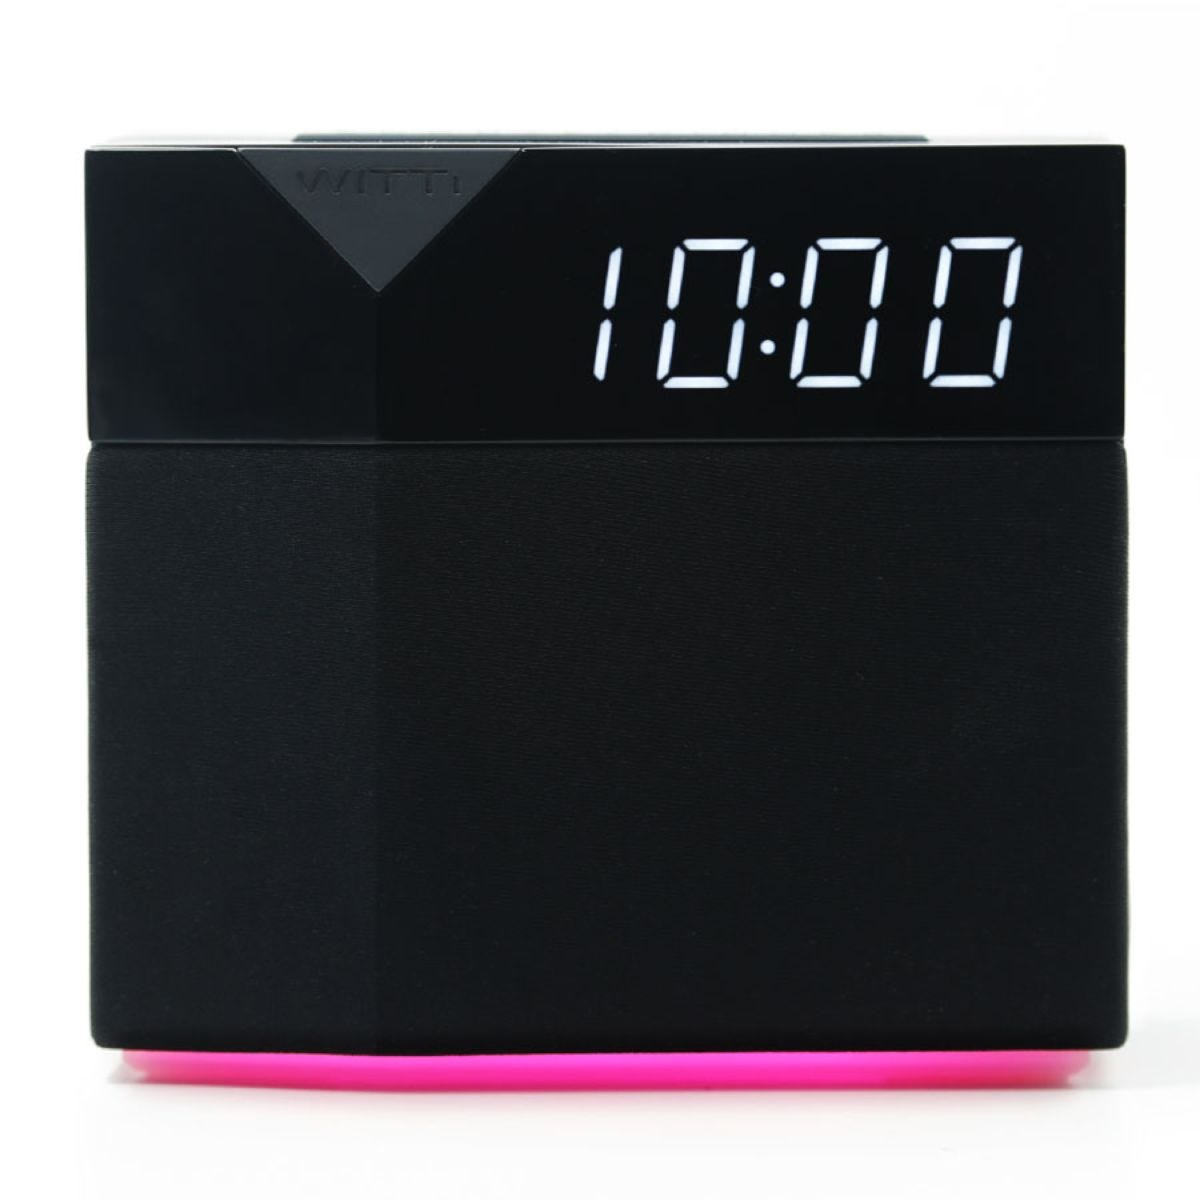 WITTI Design BEDDI Style Intelligent Alarm Clock & Bluetooth Speaker